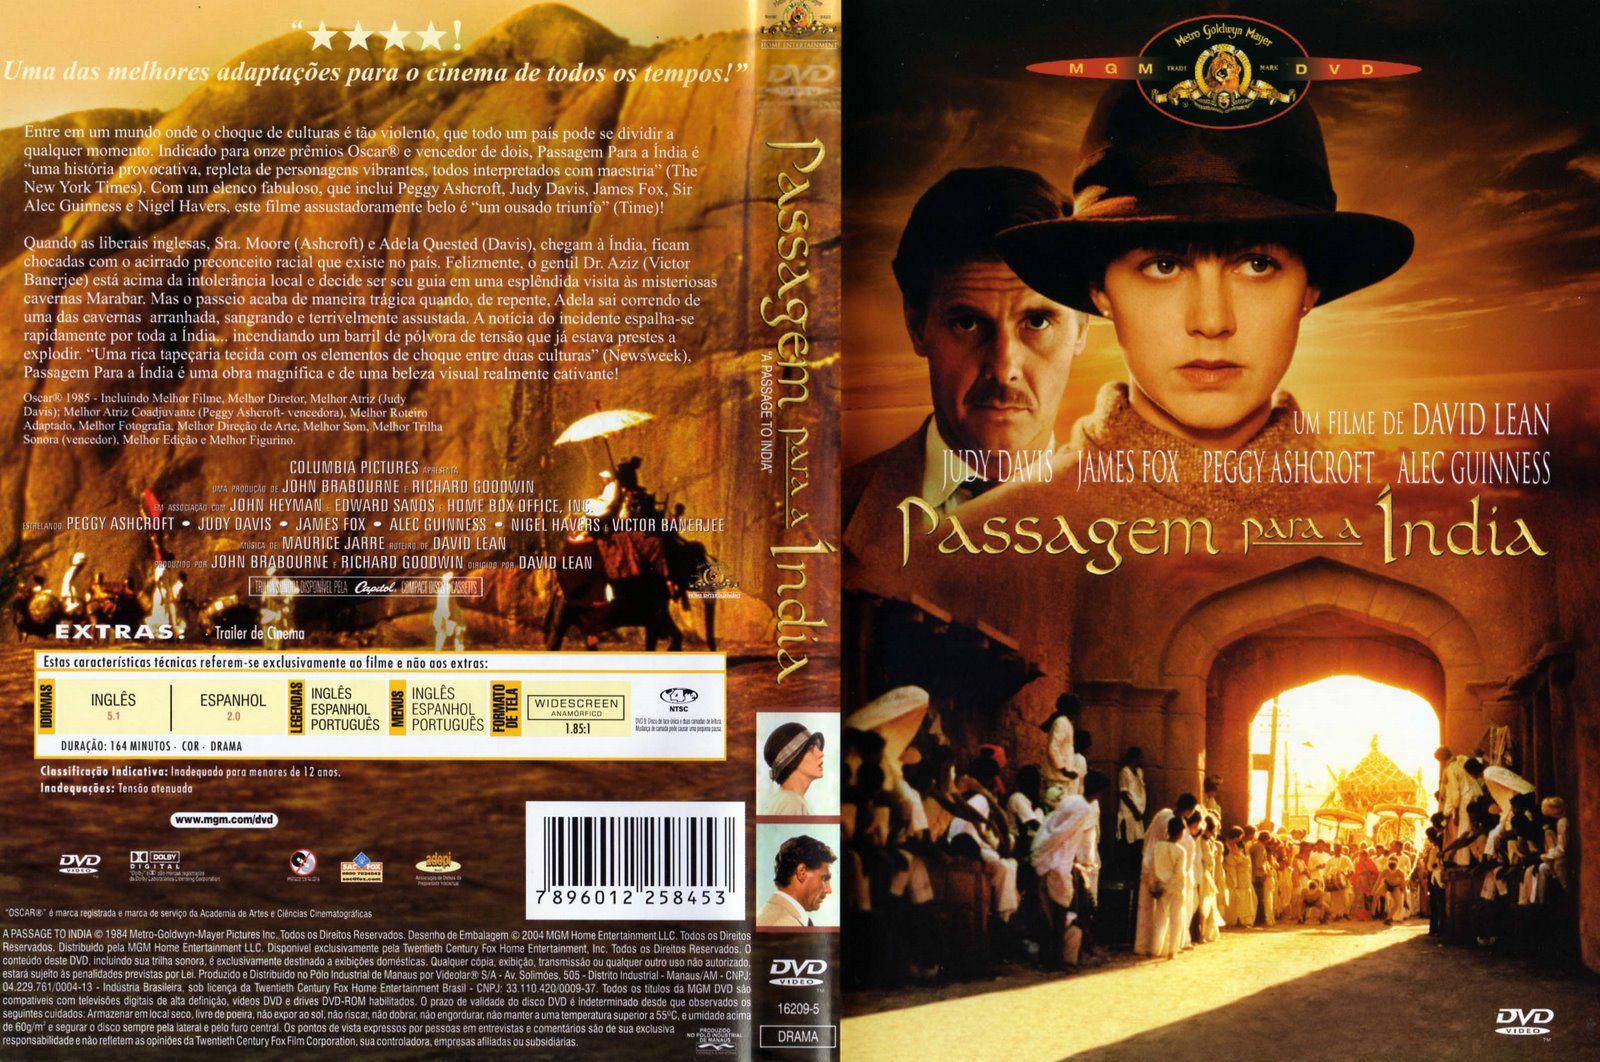 Capa DVD Passagem Para A Índia